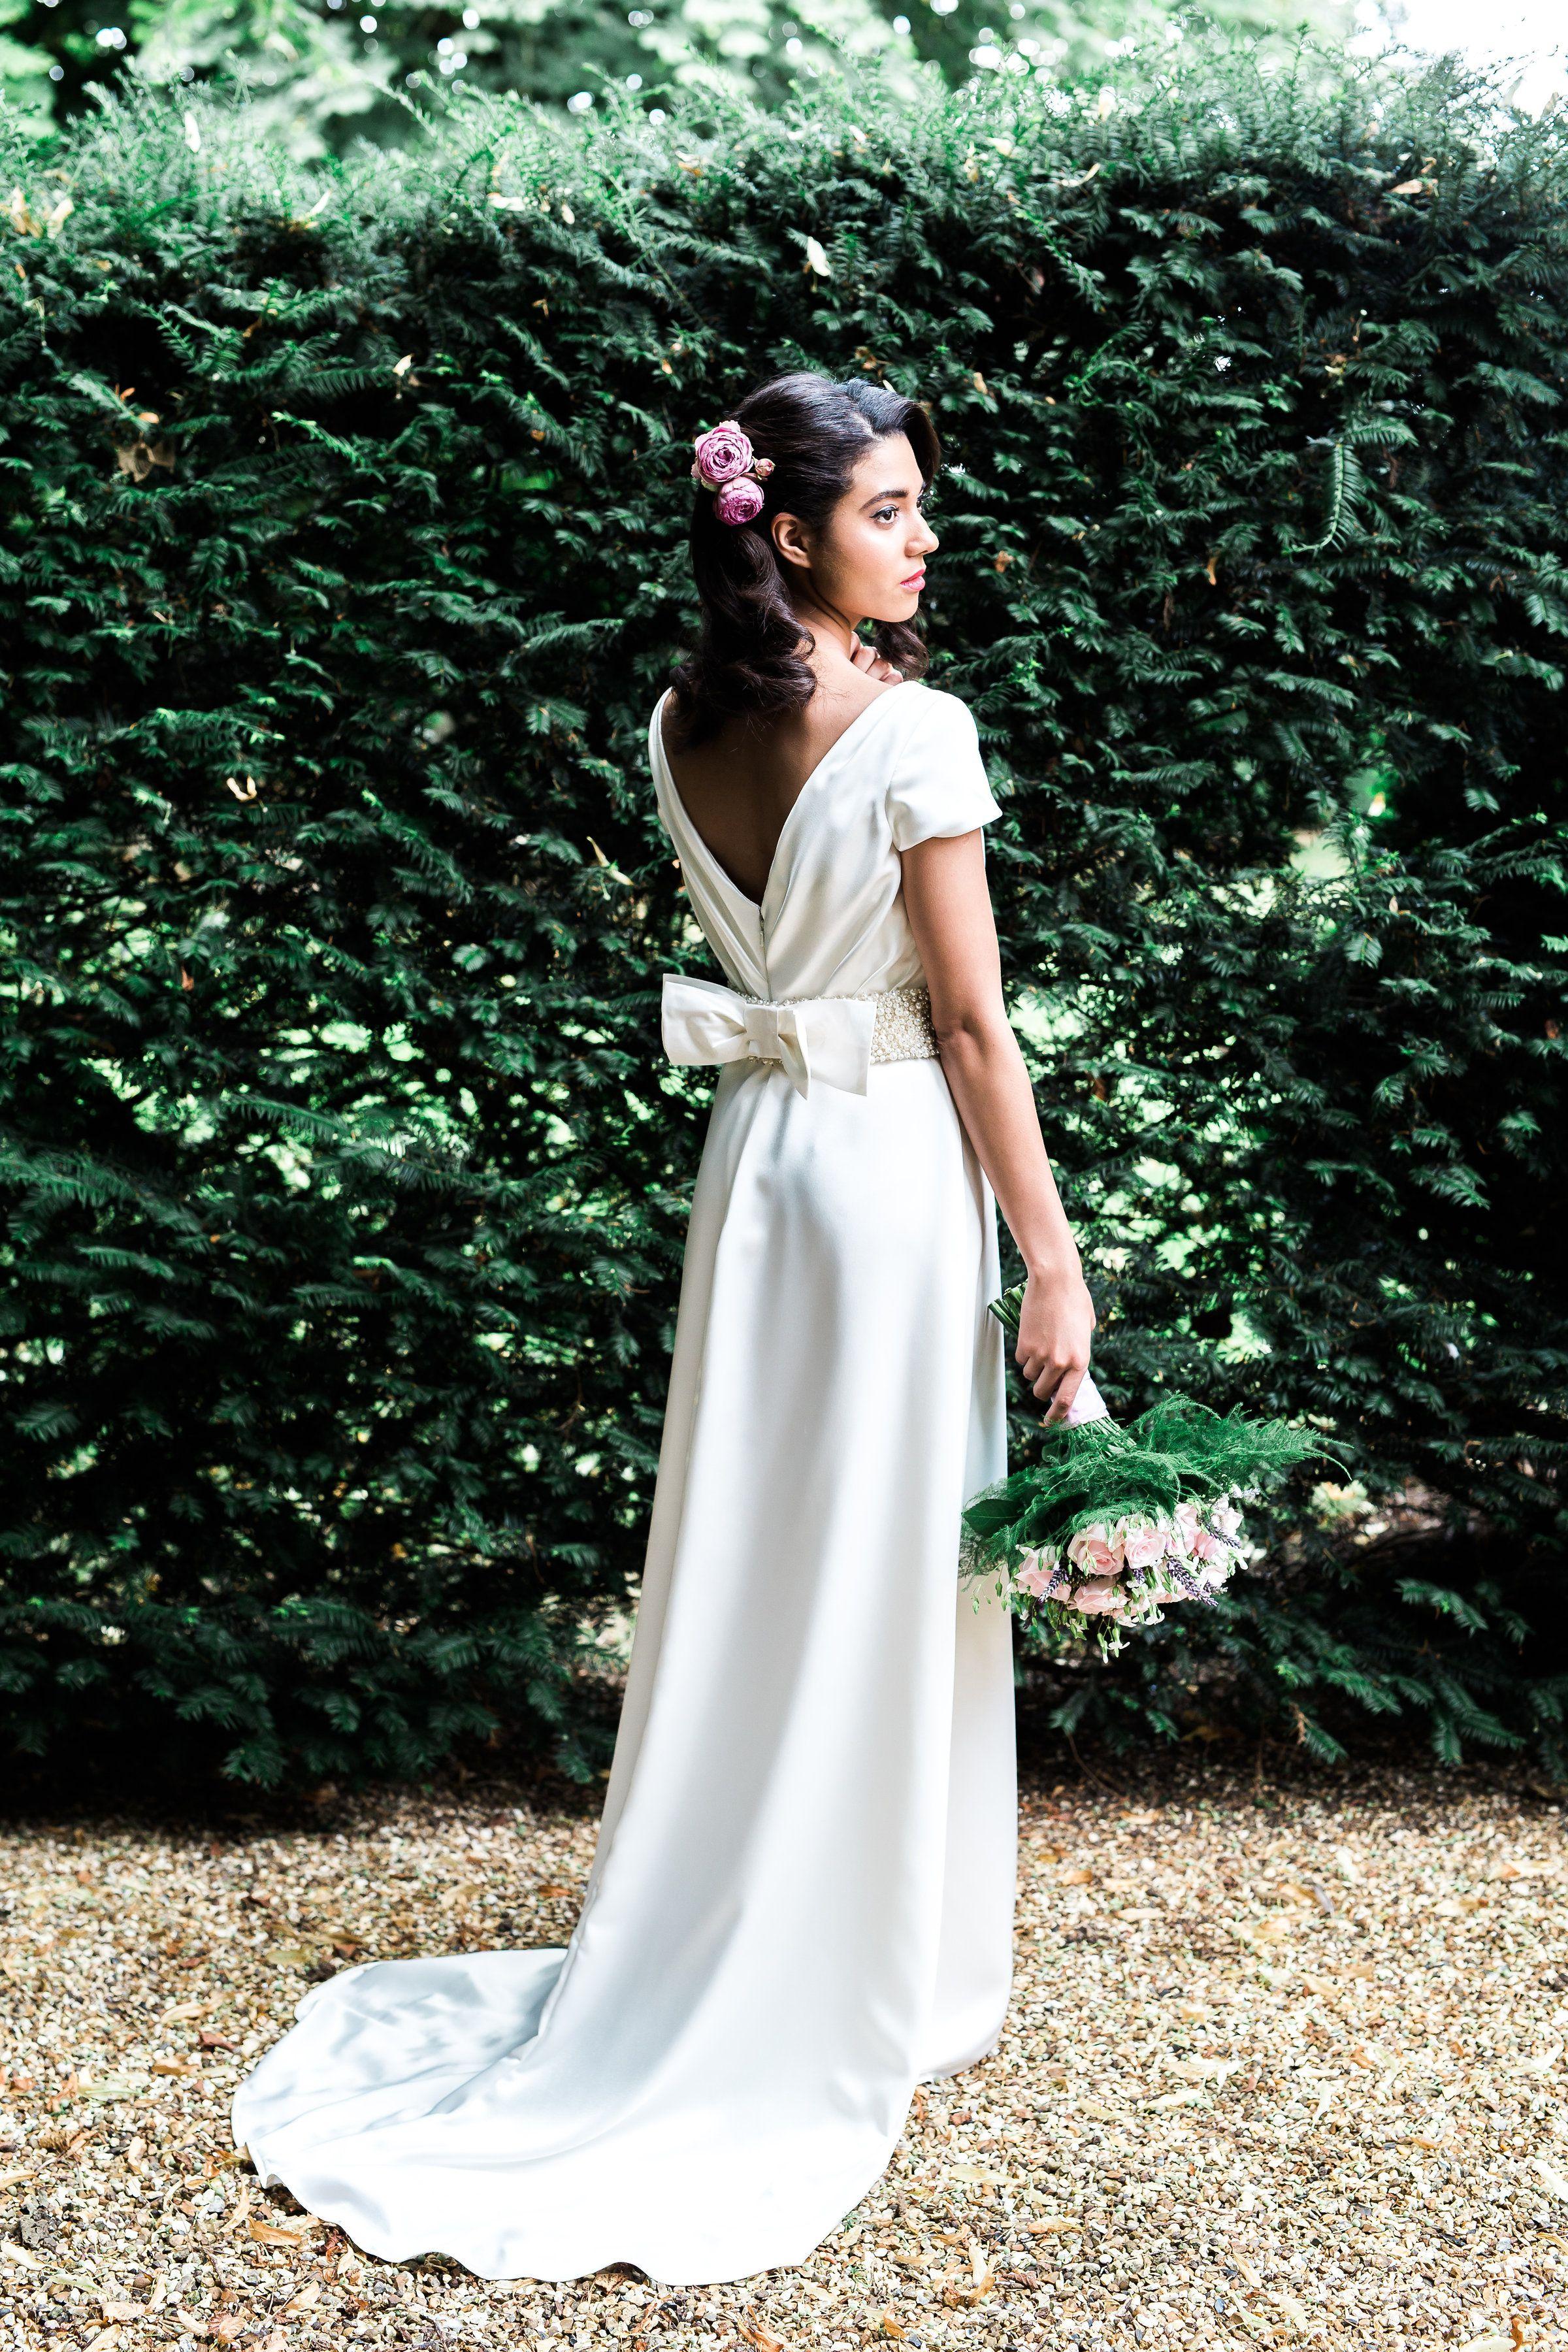 Una Ivory Satin Weddingdress By Rachel Lamb Design Image Sarahbrookesphotography Com Bespoke Wedding Dress Designer Wedding Dresses Bespoke Wedding Gown